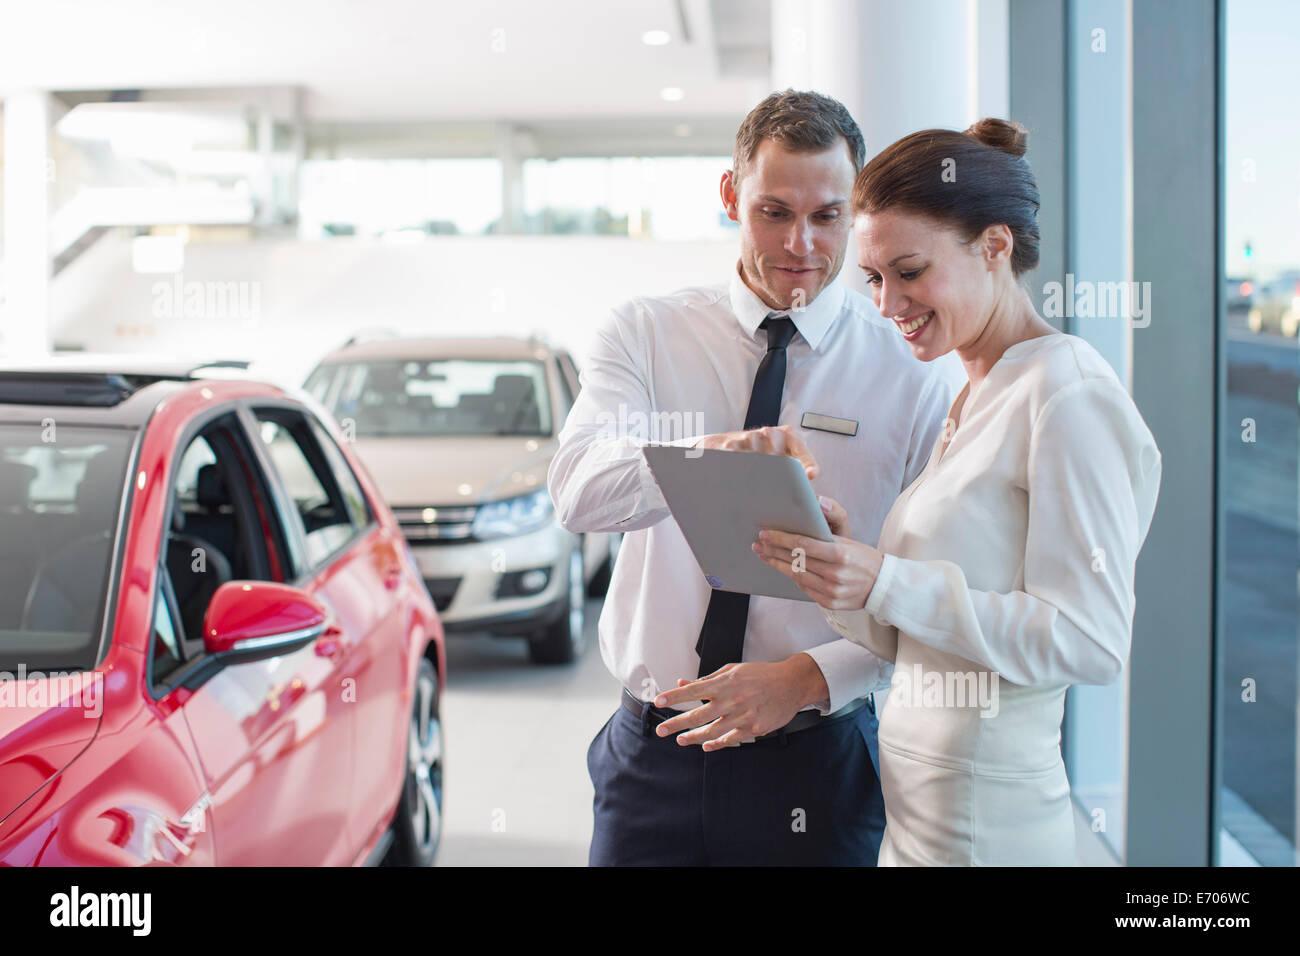 Salesman and female customer using digital tablet in car dealership - Stock Image